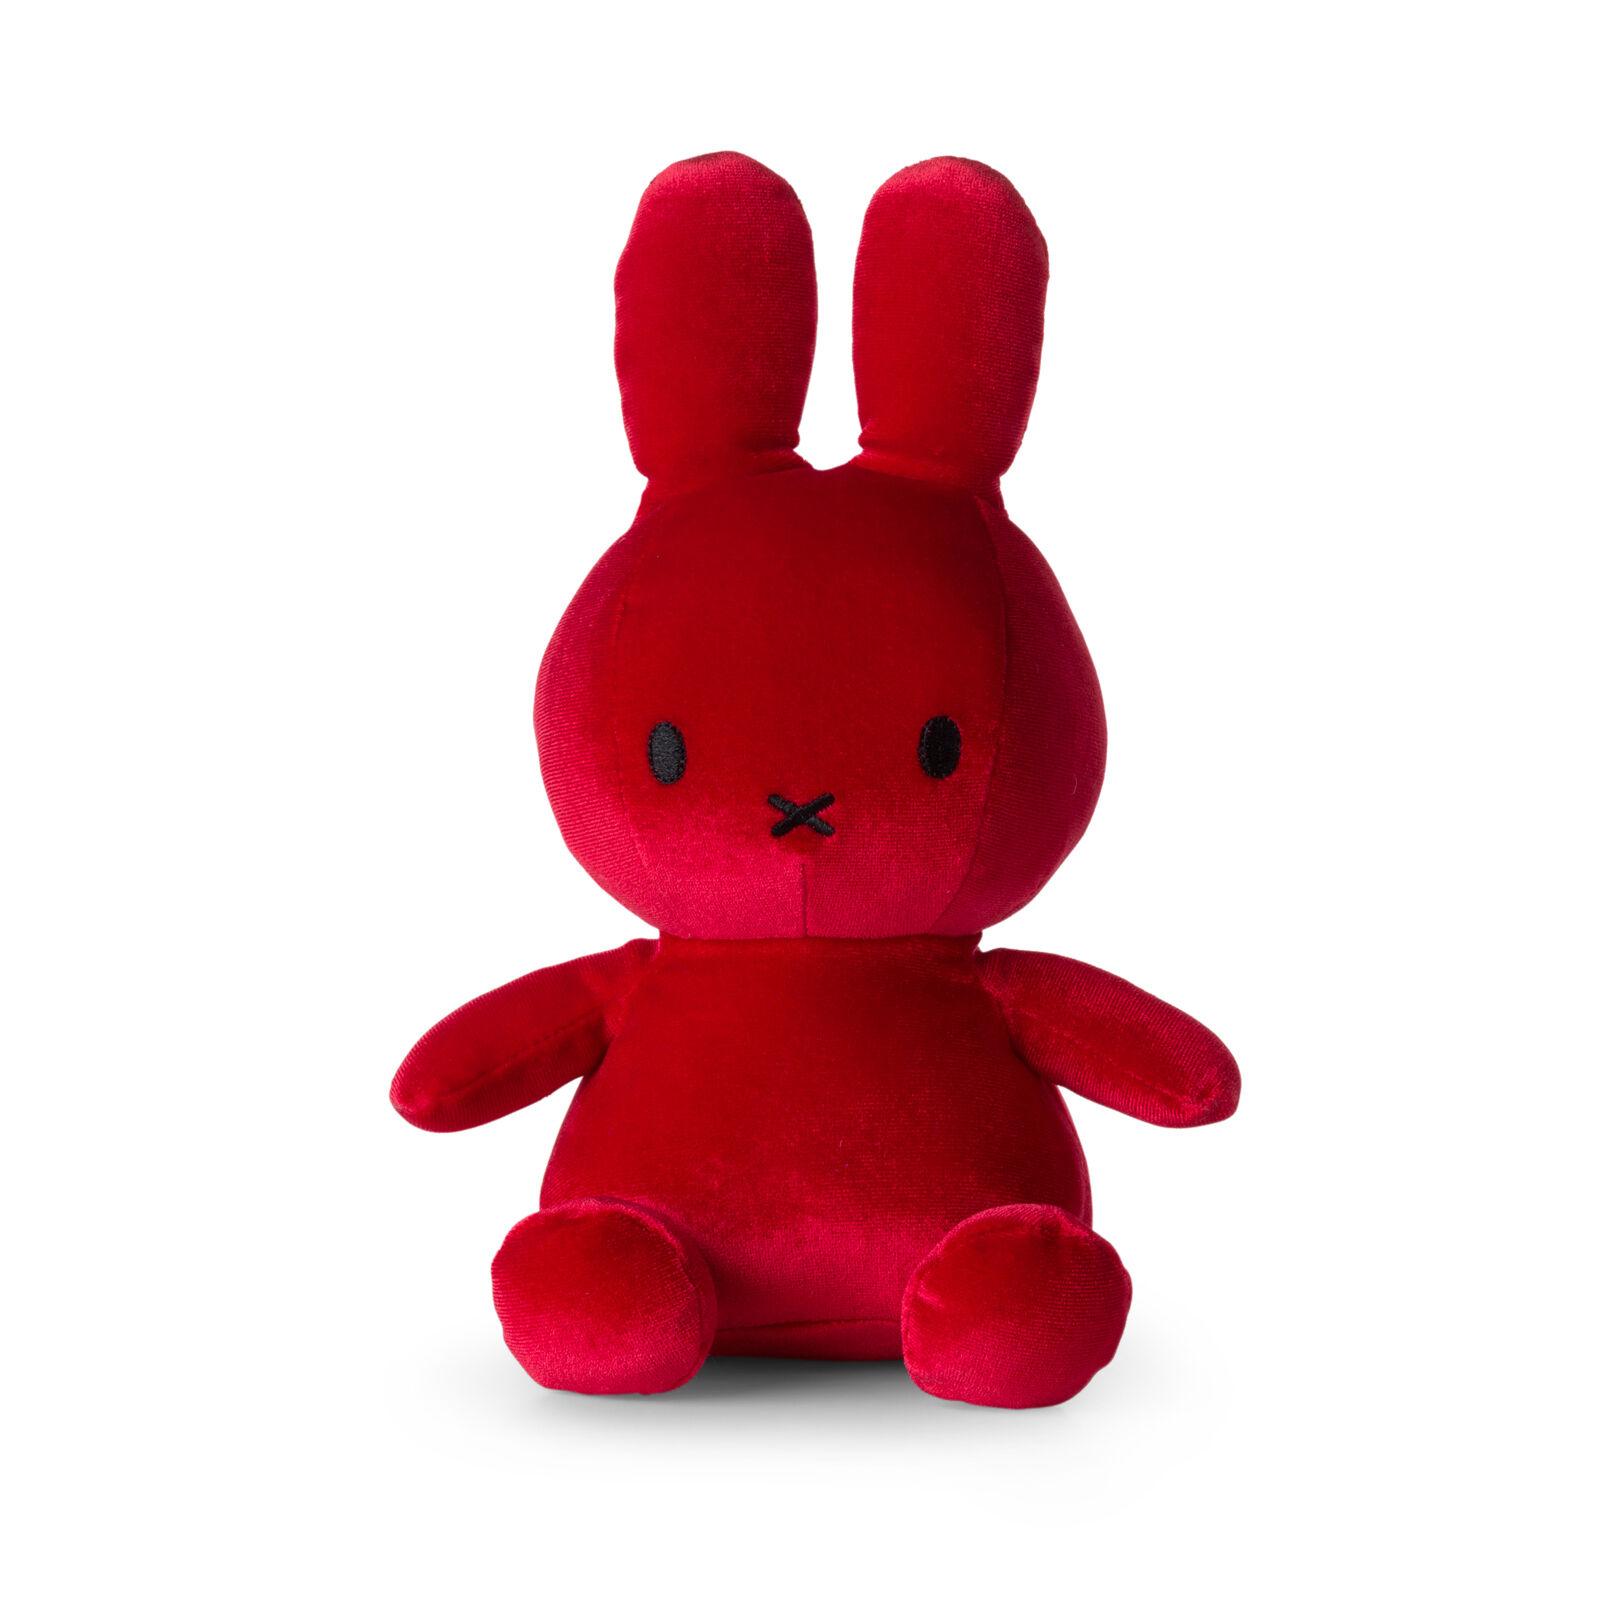 Nijntje Knuffel Velvet Candy Red 23 cm